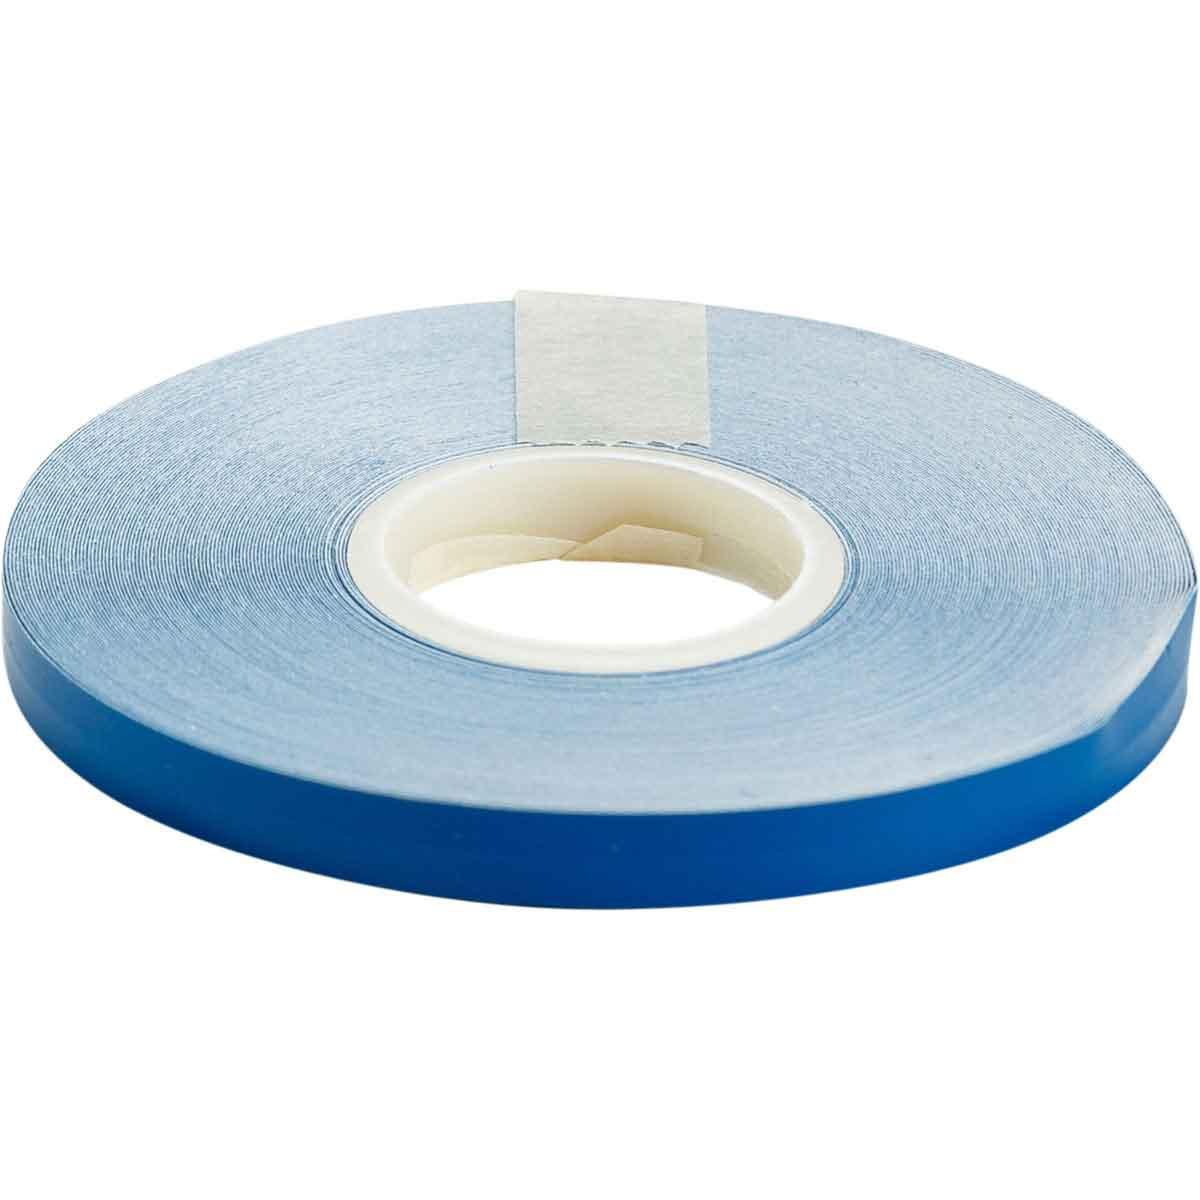 Brady® 121123 Non-Reflective Border Line Tape, 50 ft L x 1/4 in W, Blue, B-7569 Vinyl Film